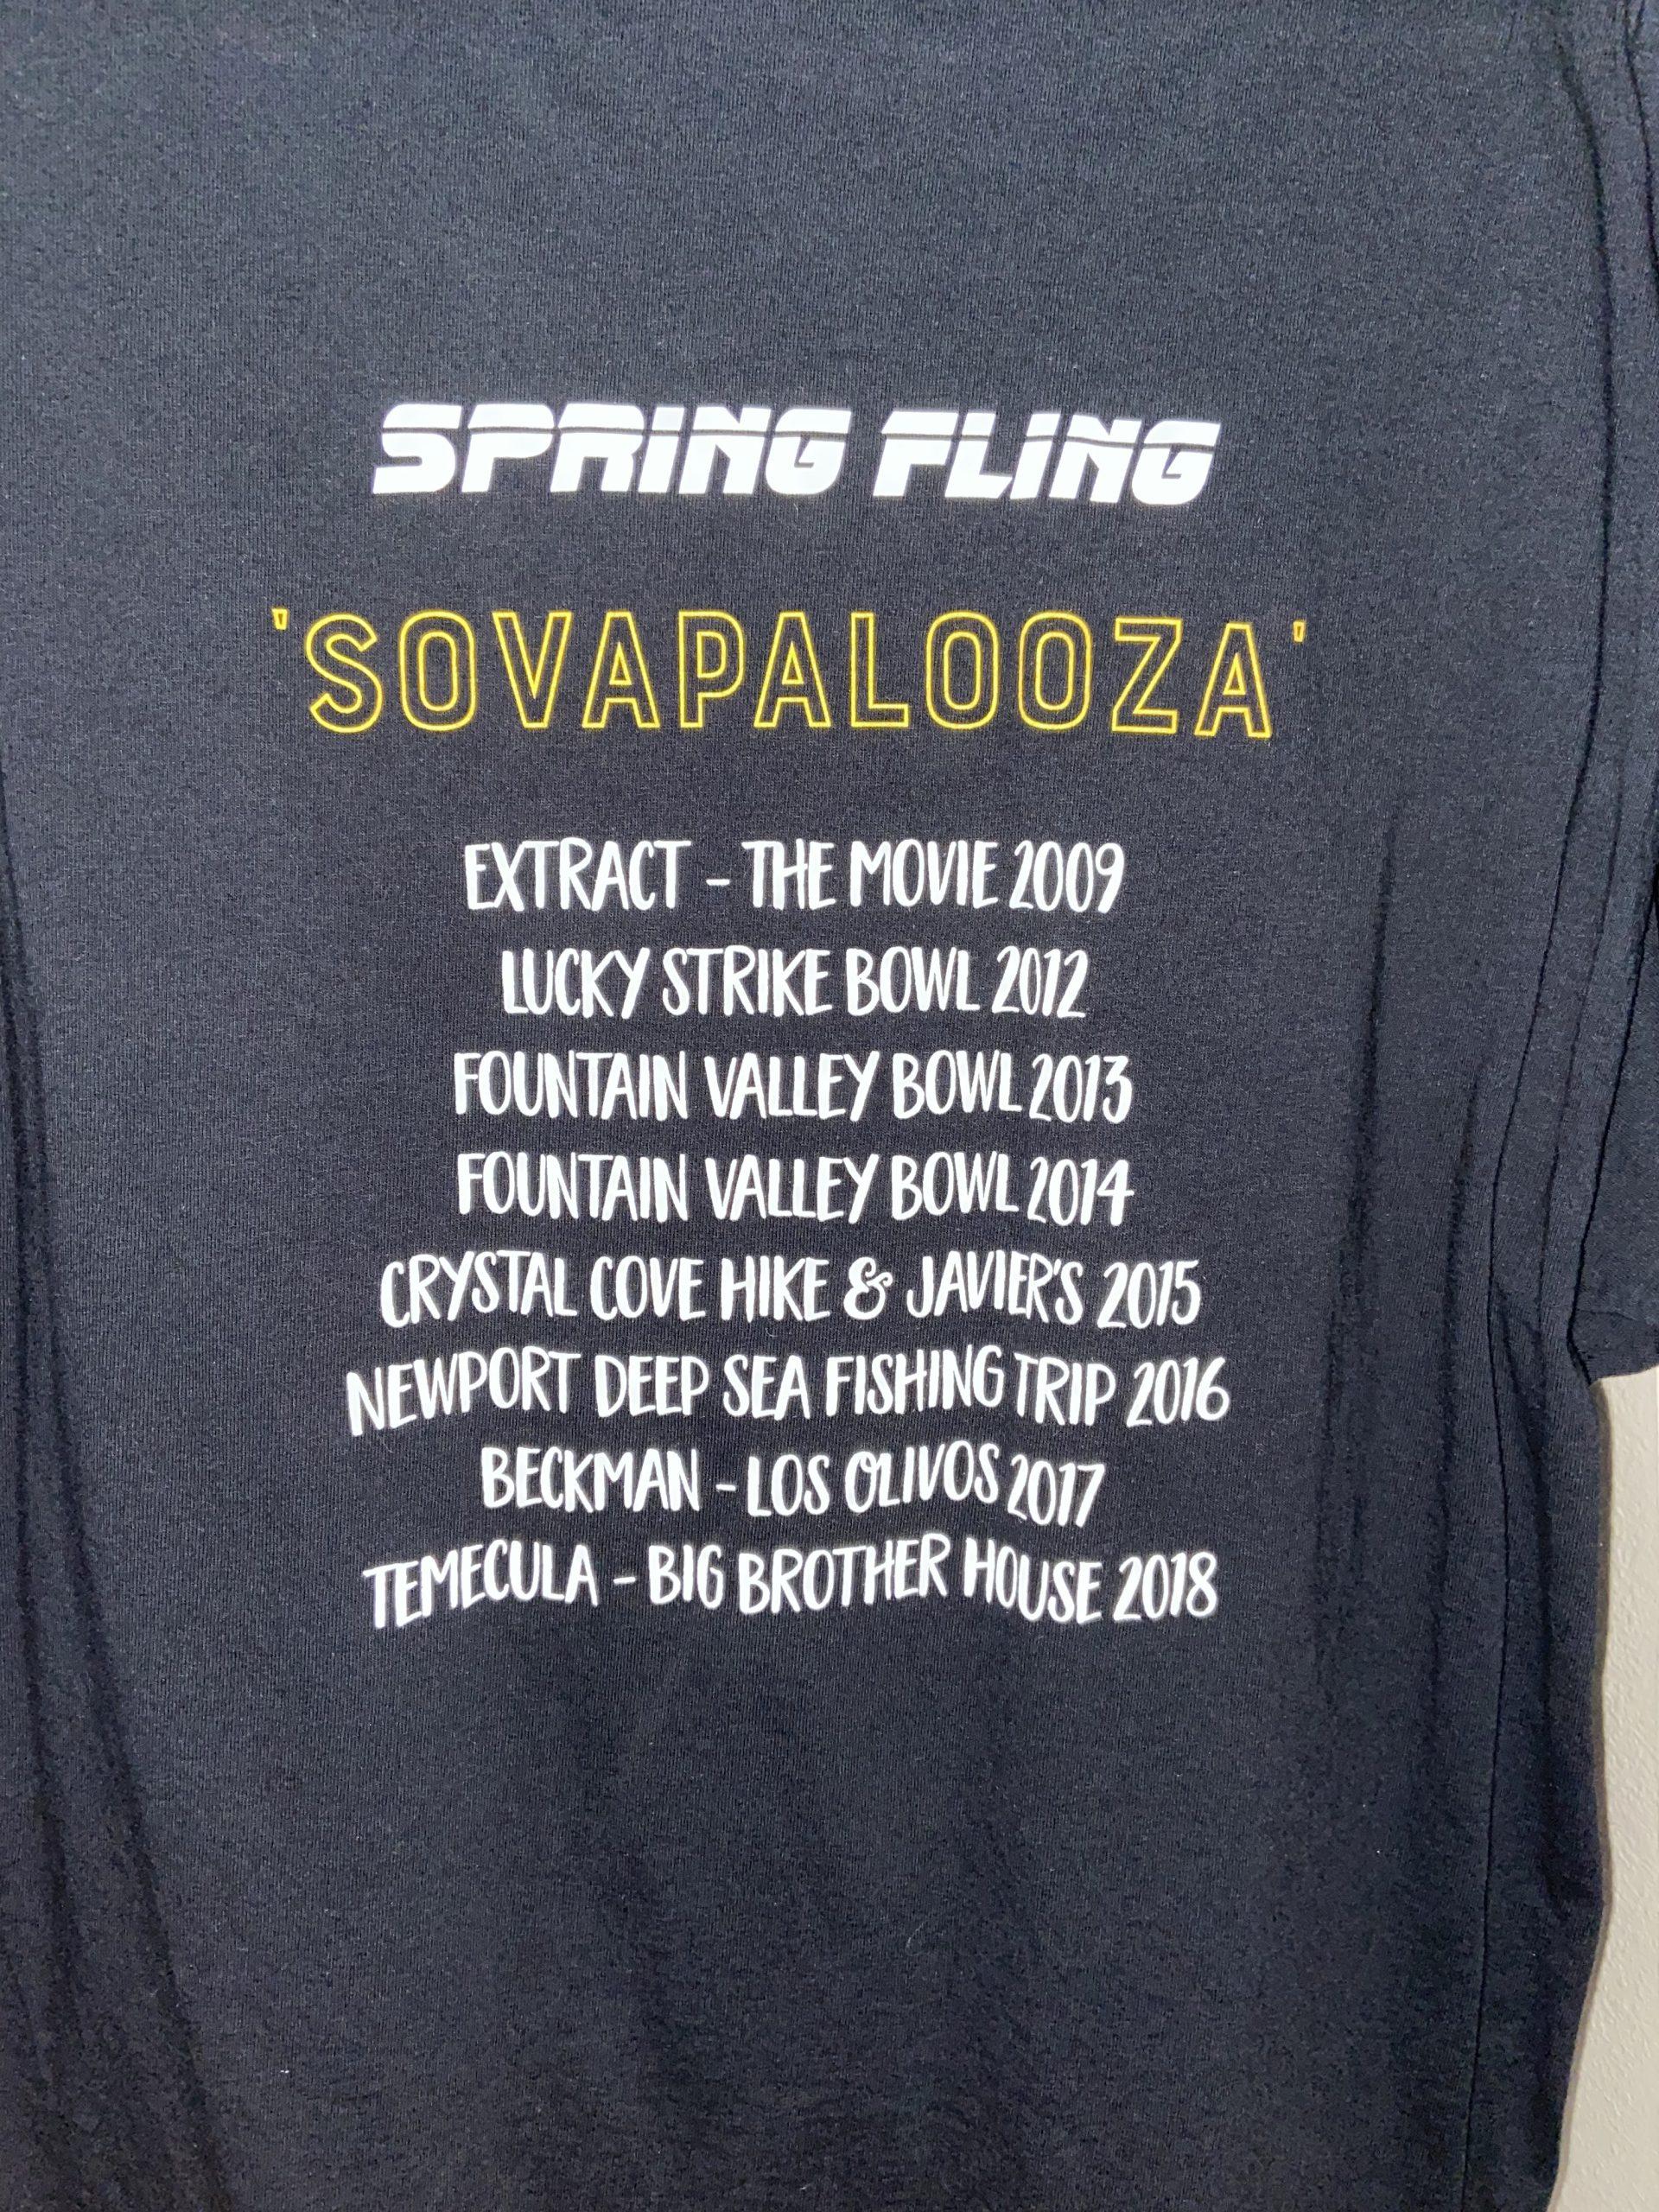 Sovereign Flavors Spring Fling Image